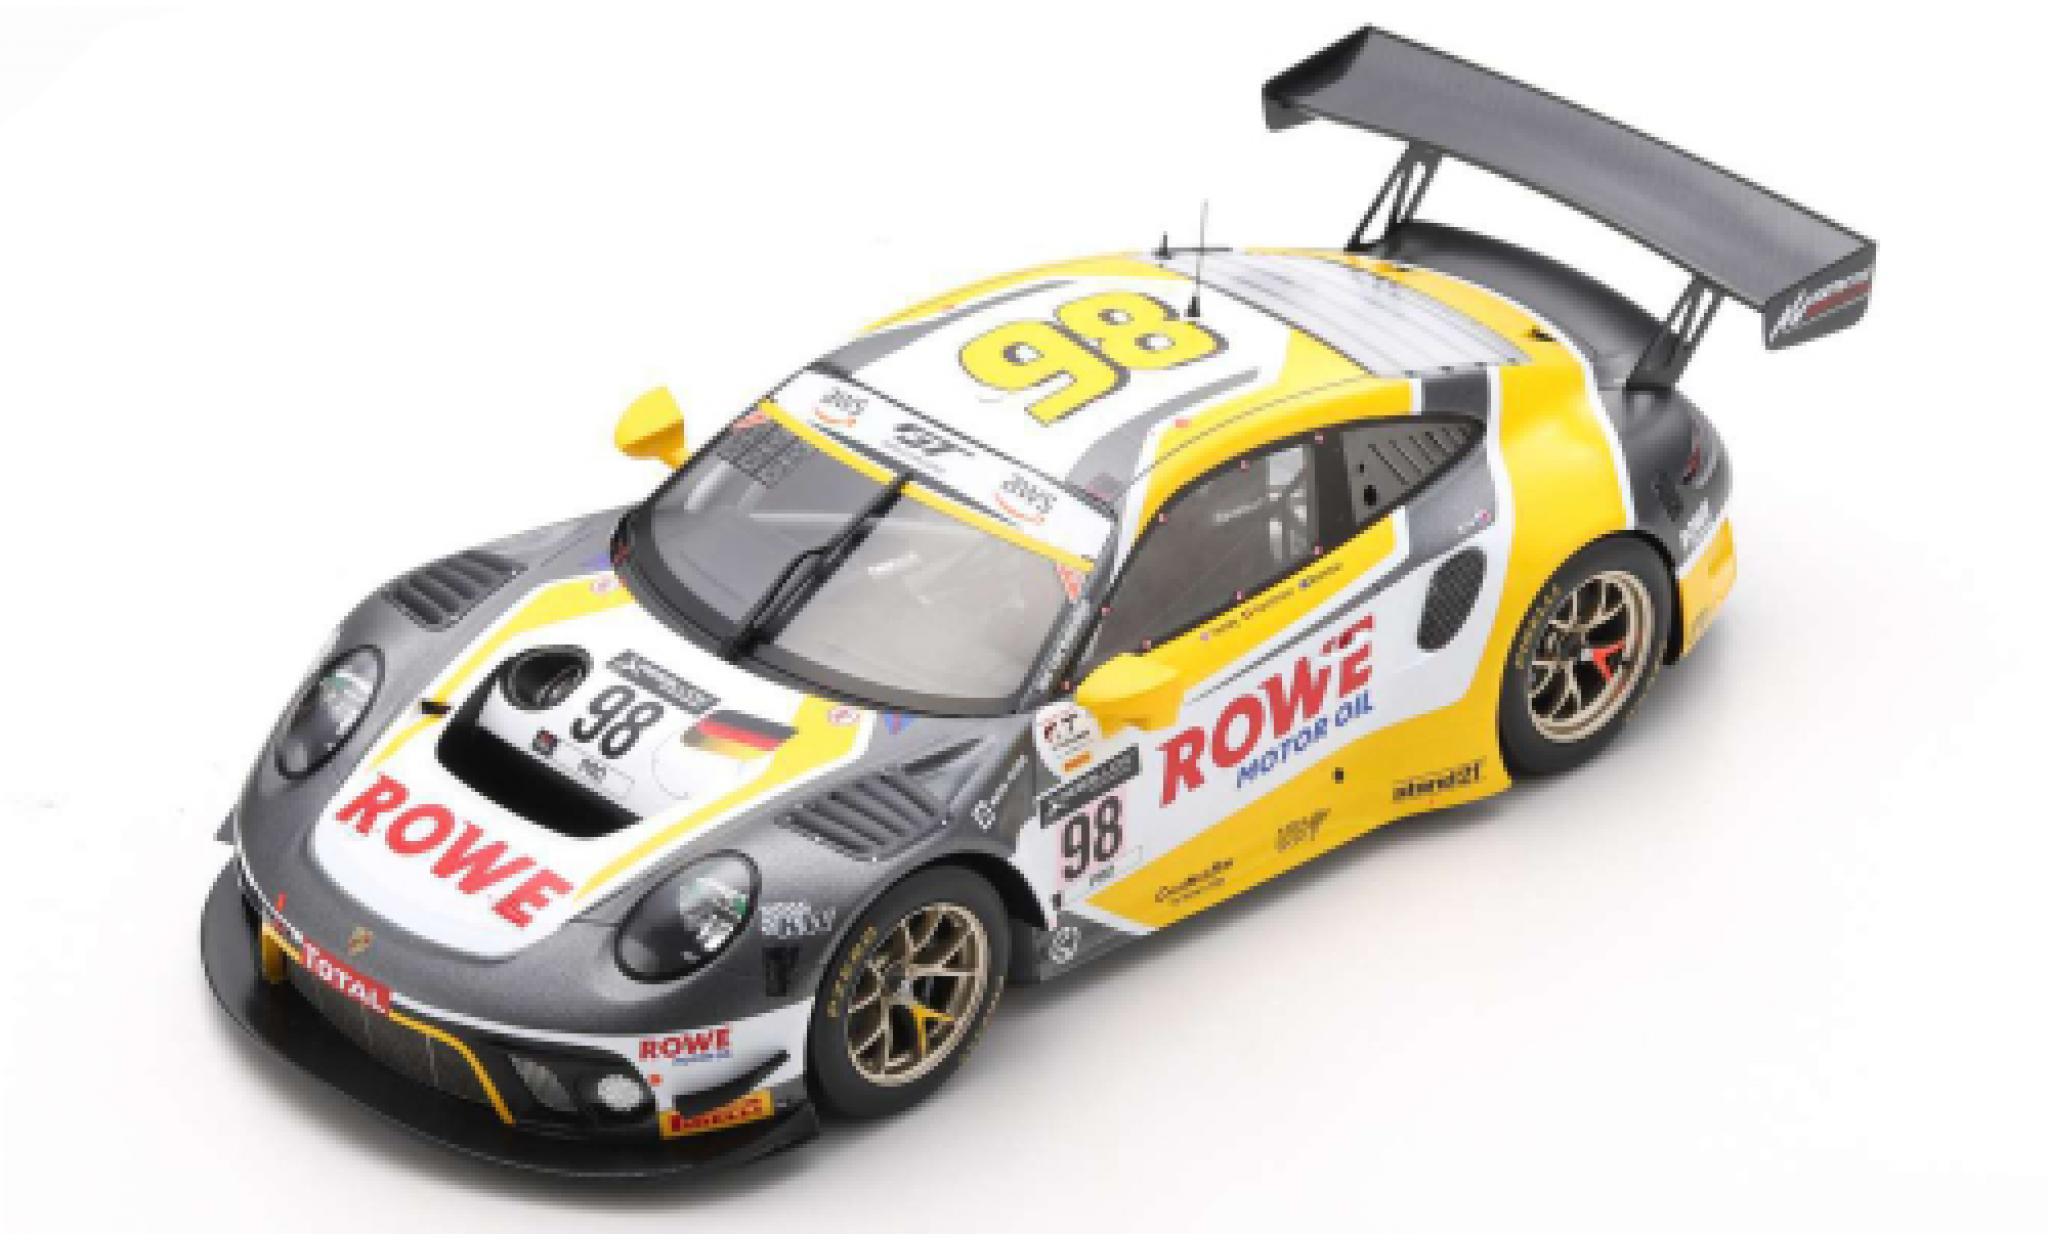 Porsche 992 GT3 R 1/18 Spark 911 (991) No.98 Rowe Racing 24h Spa 2020 L.Vanthoor/N.Tandy/E.Bamber